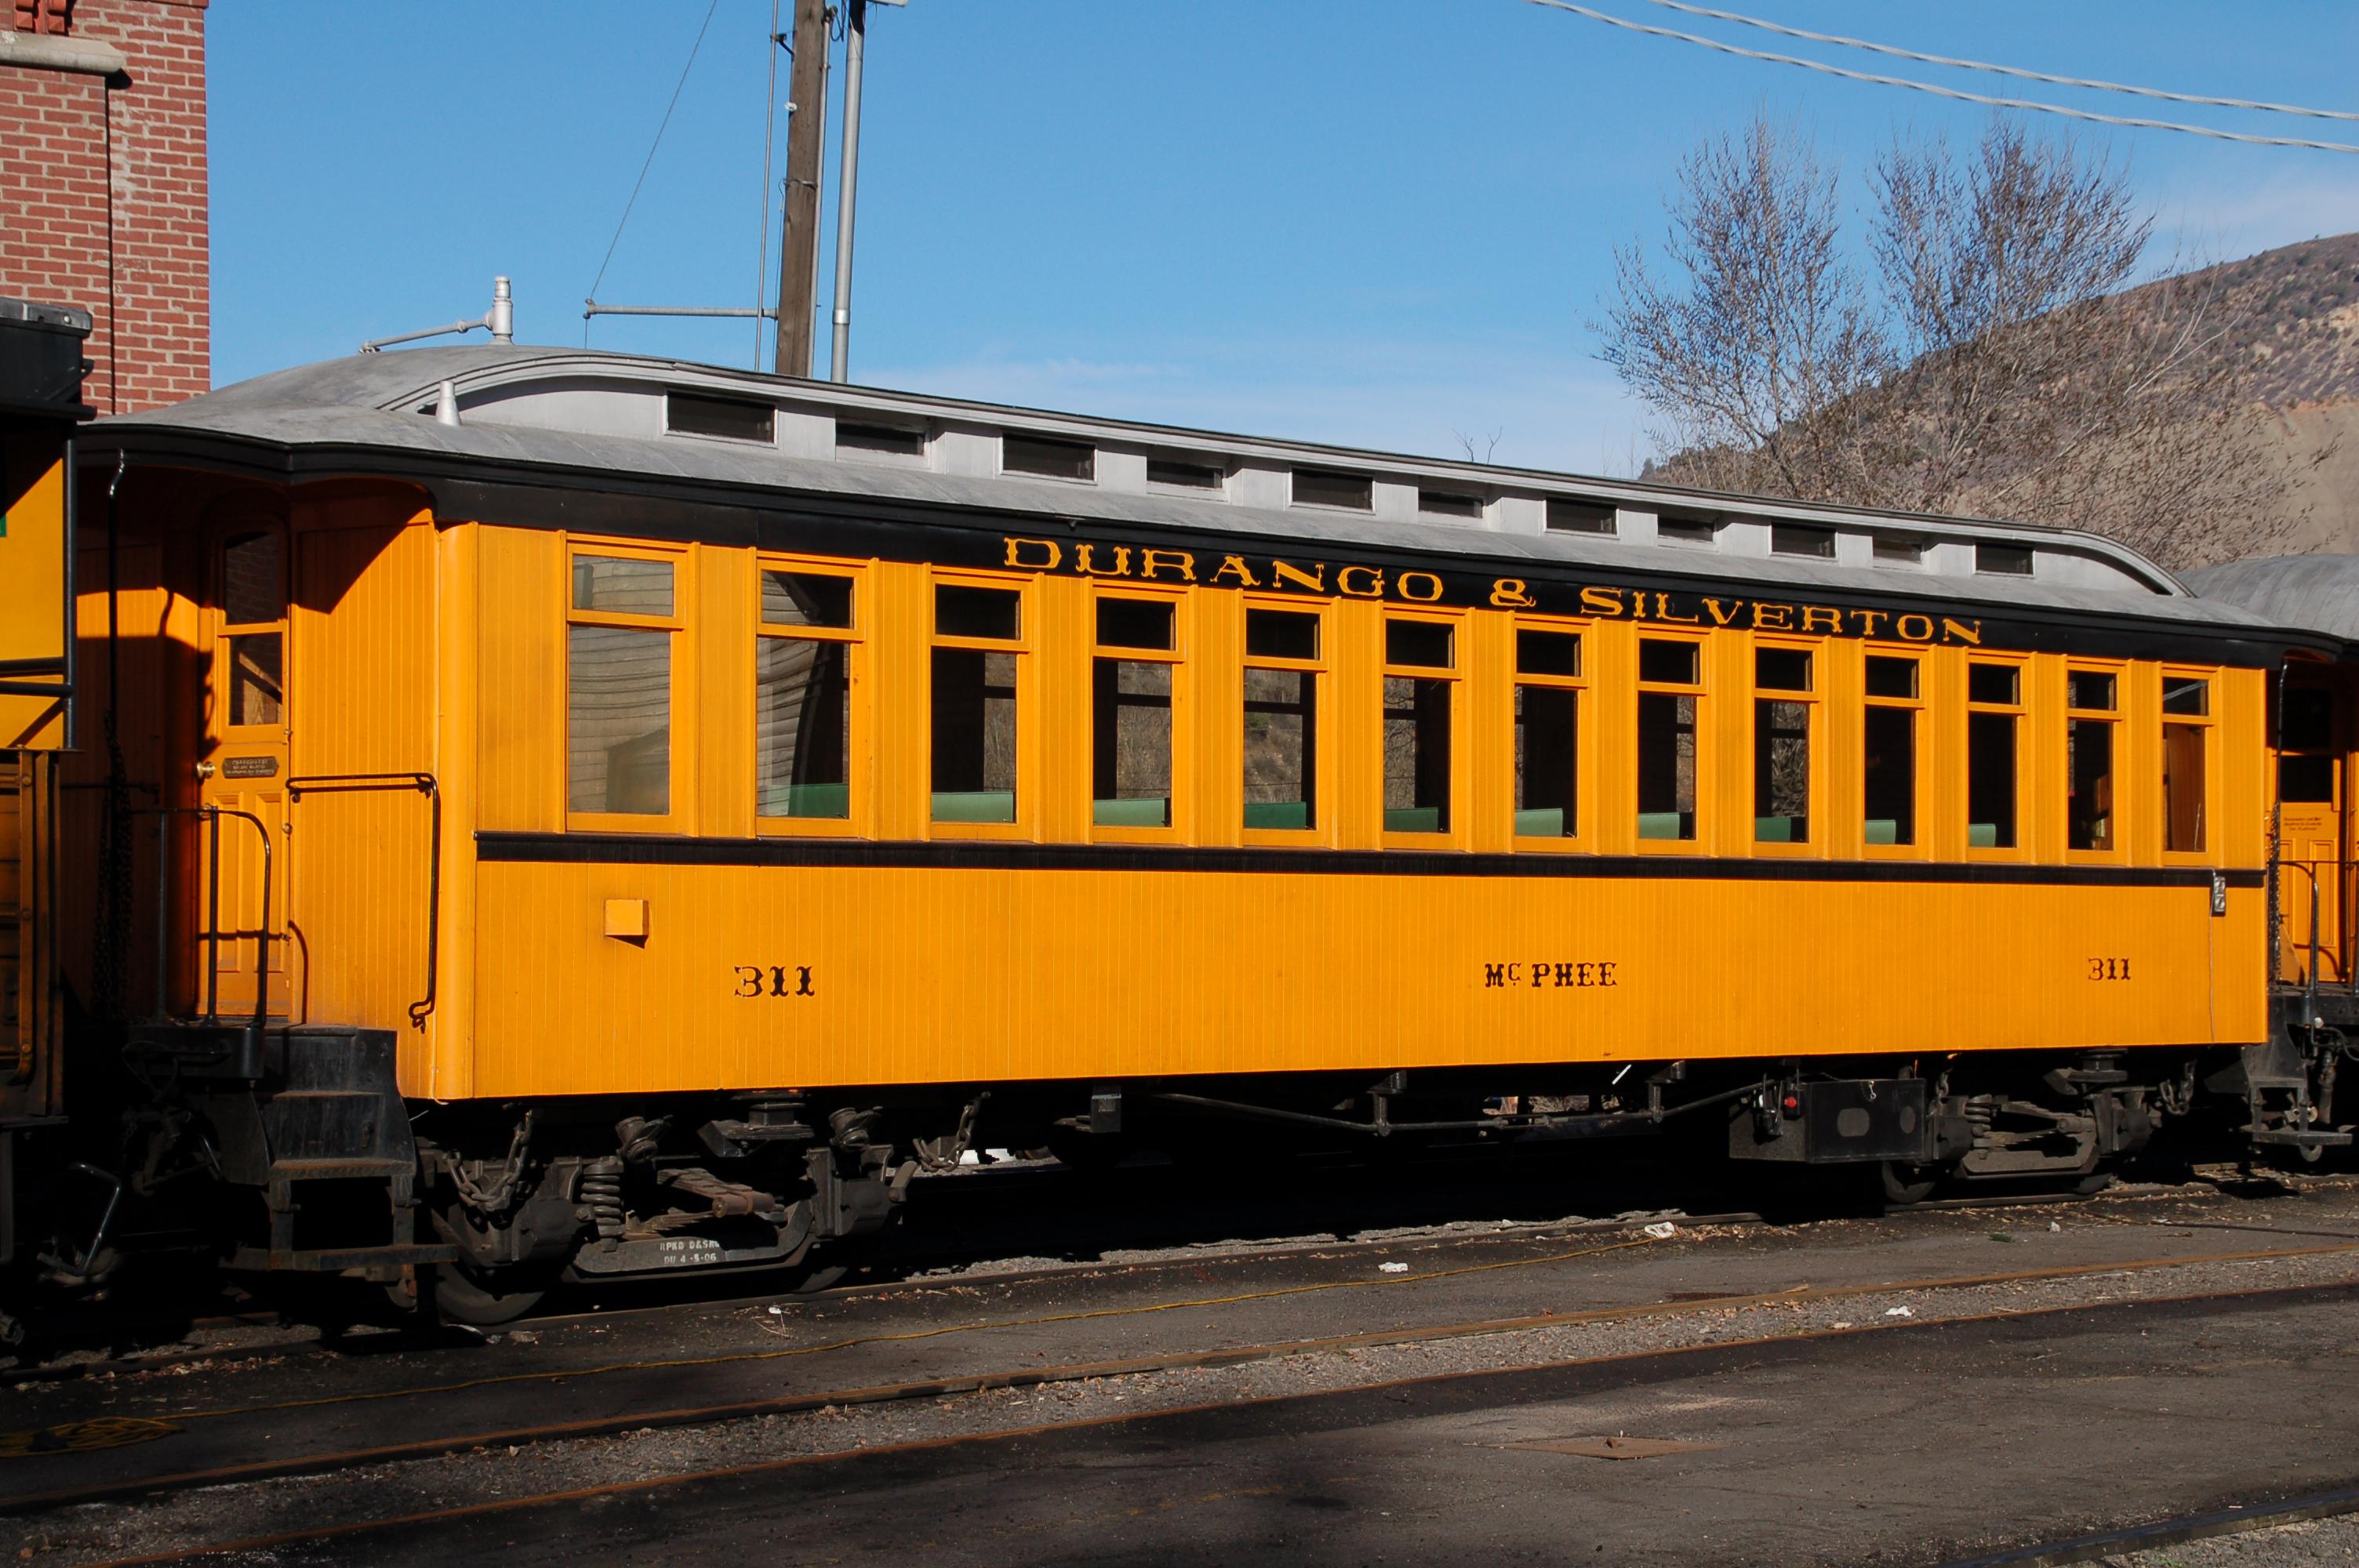 coach311.jpg